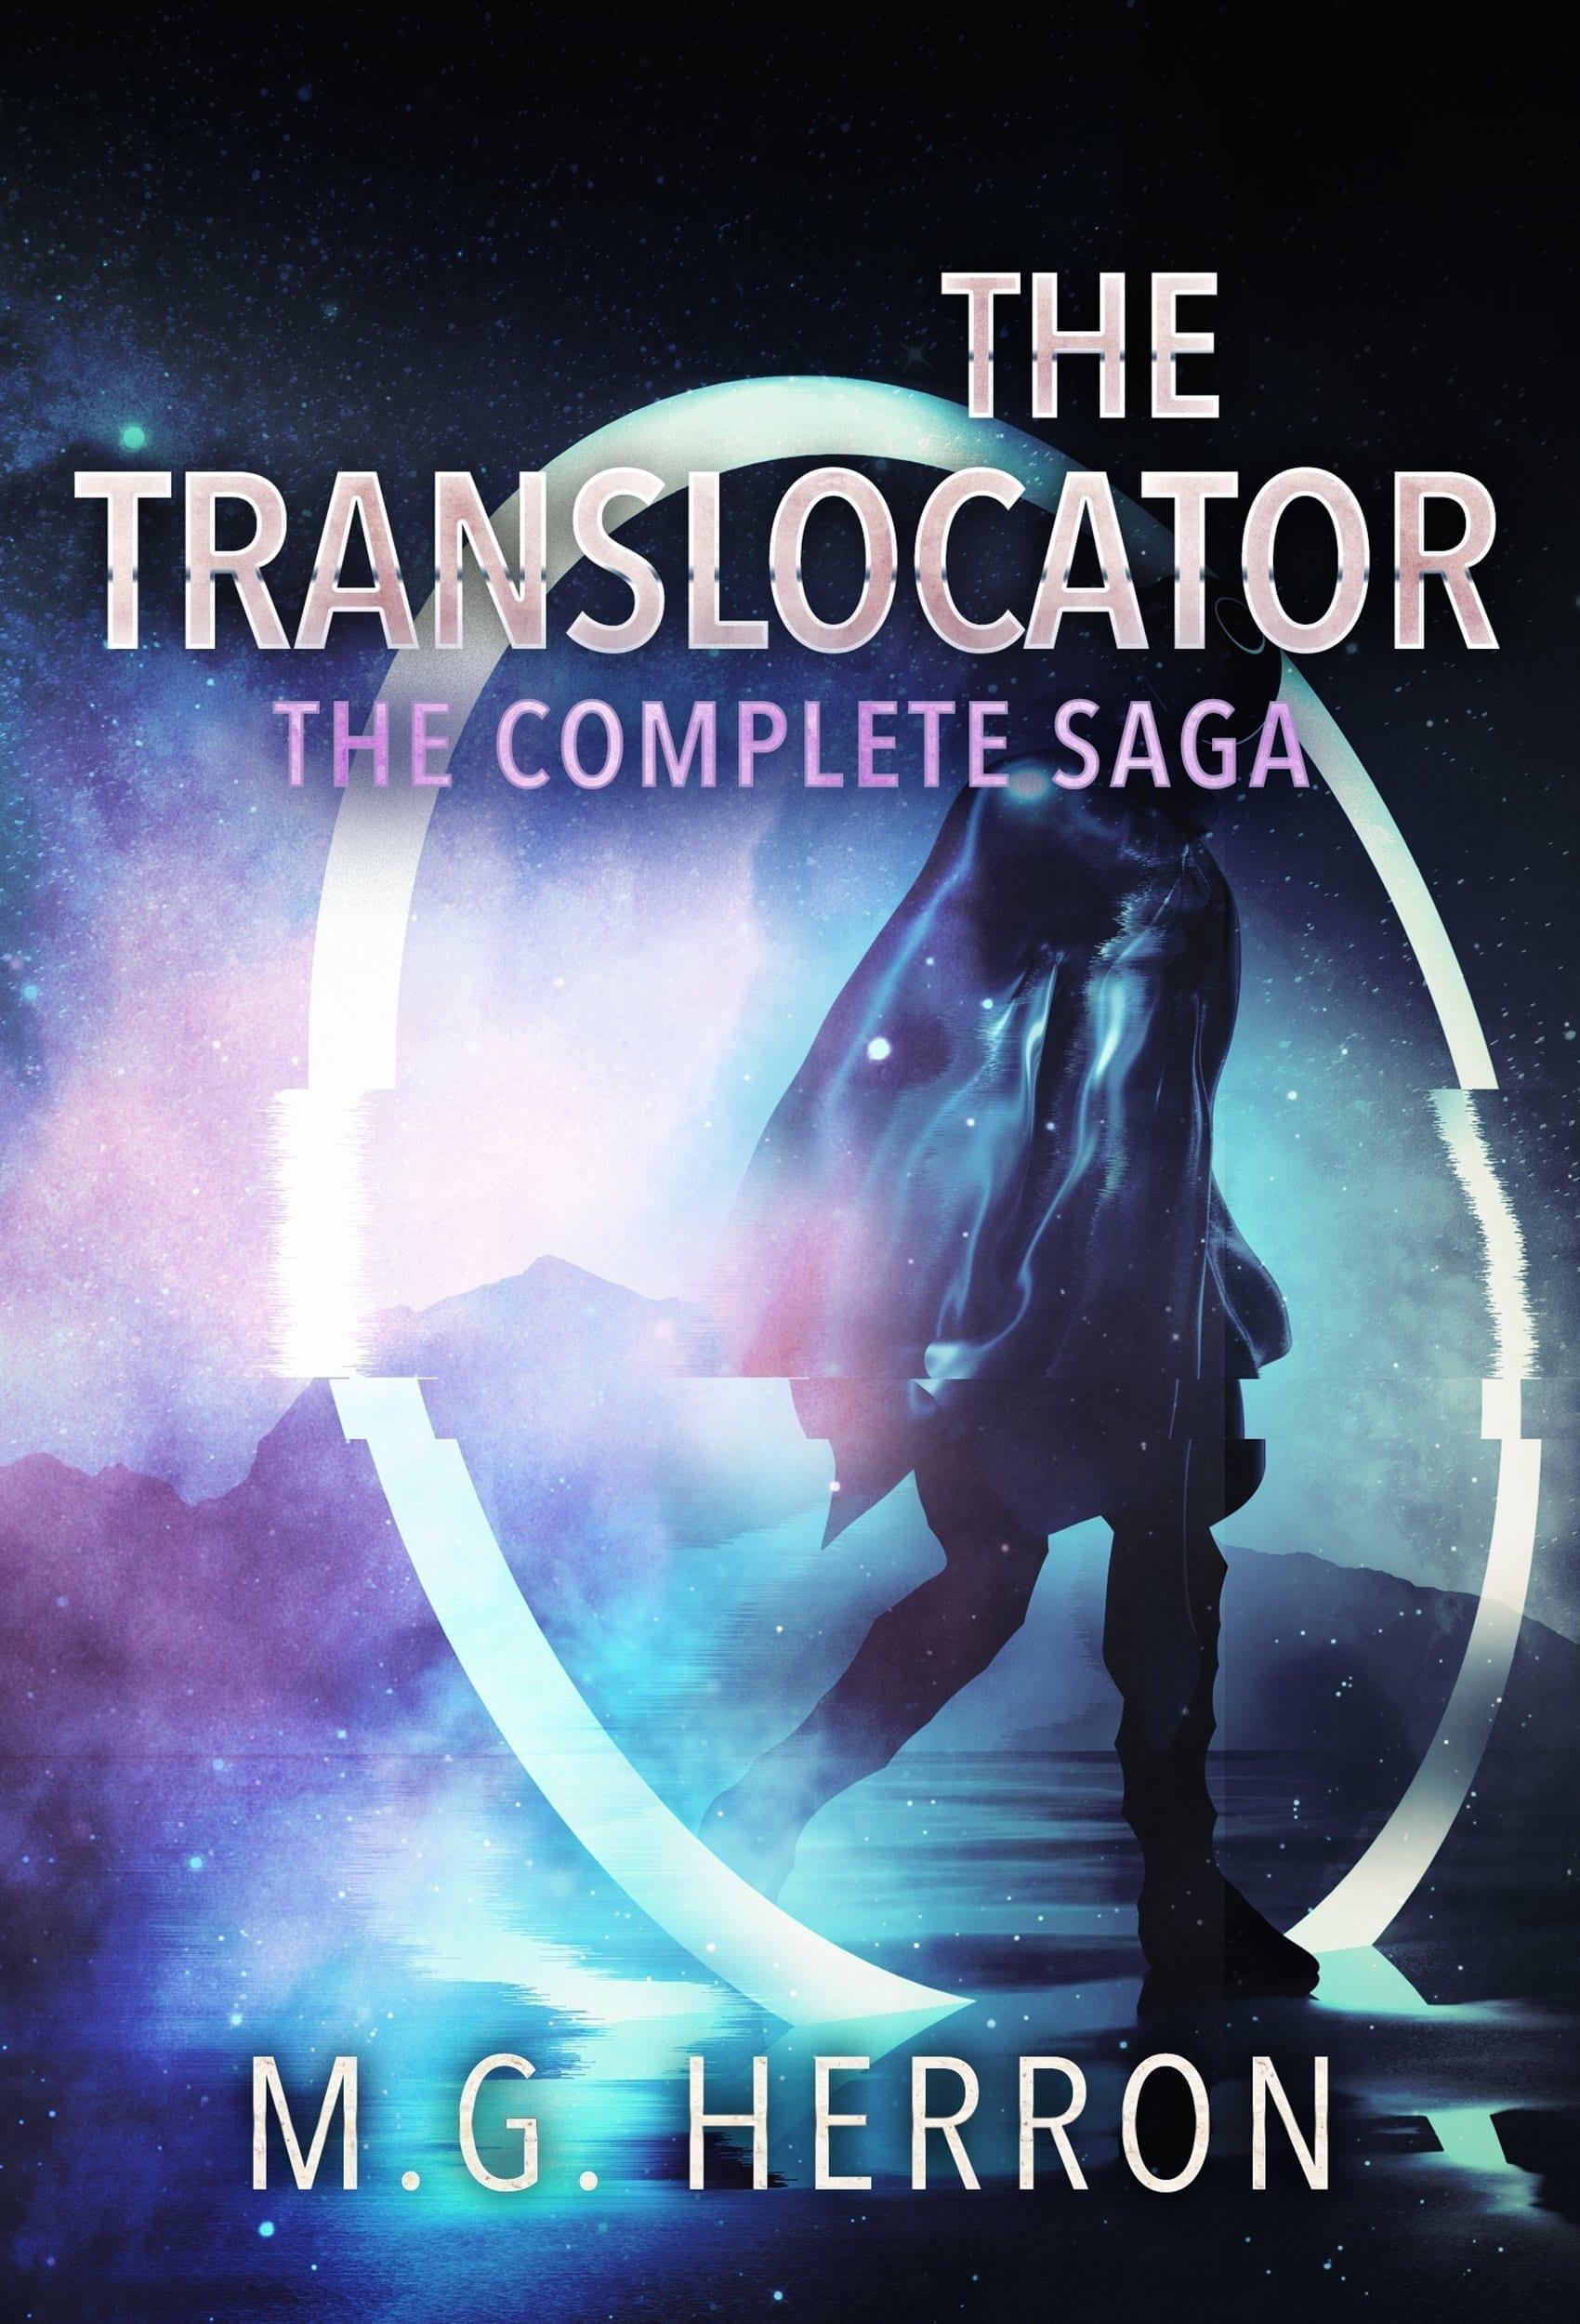 The Translocator_Ebook_B1-Subtitle-1700px 2500px